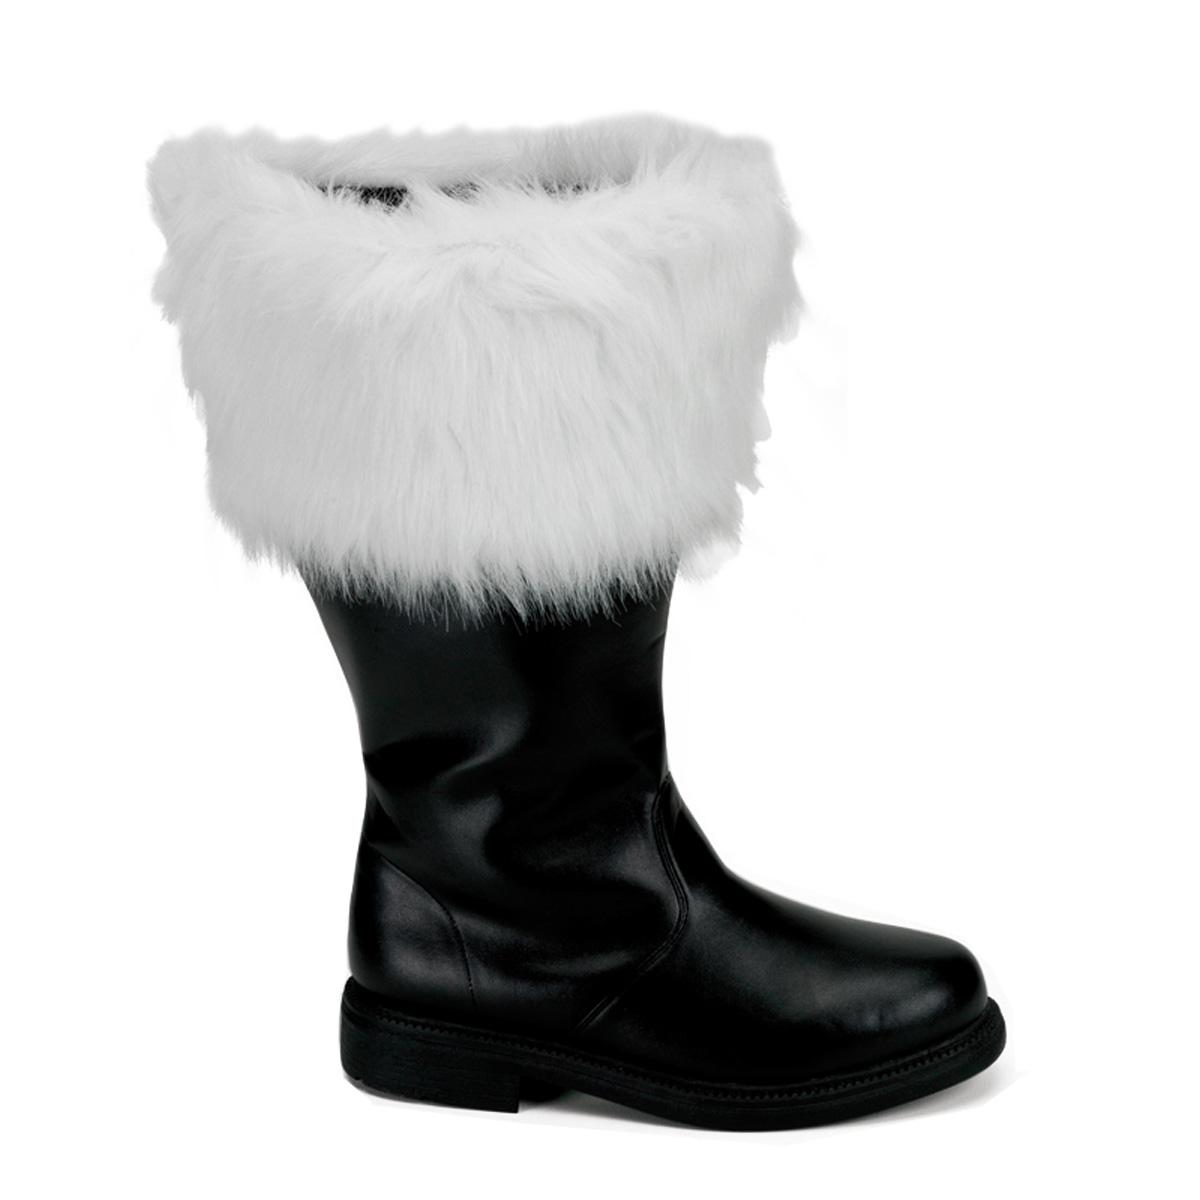 FUNTASMA Santa-106WC Halloween Blk Pu-Wht Faux Fur Costume Cosplay Halloween Santa-106WC Stivali 702f39